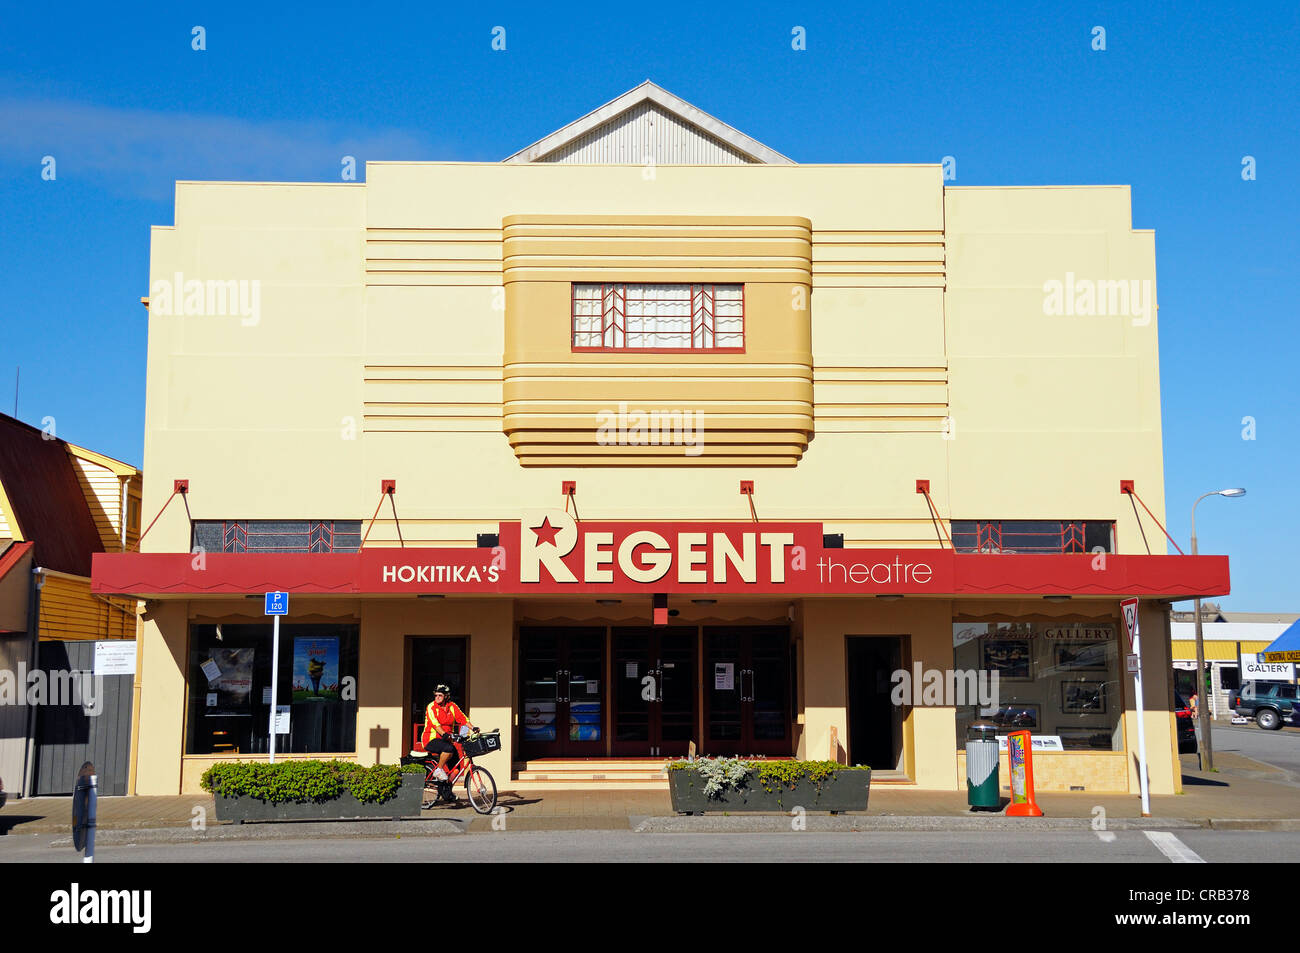 Art Deco Cinema New Zealand Stock Photos & Art Deco Cinema New ...